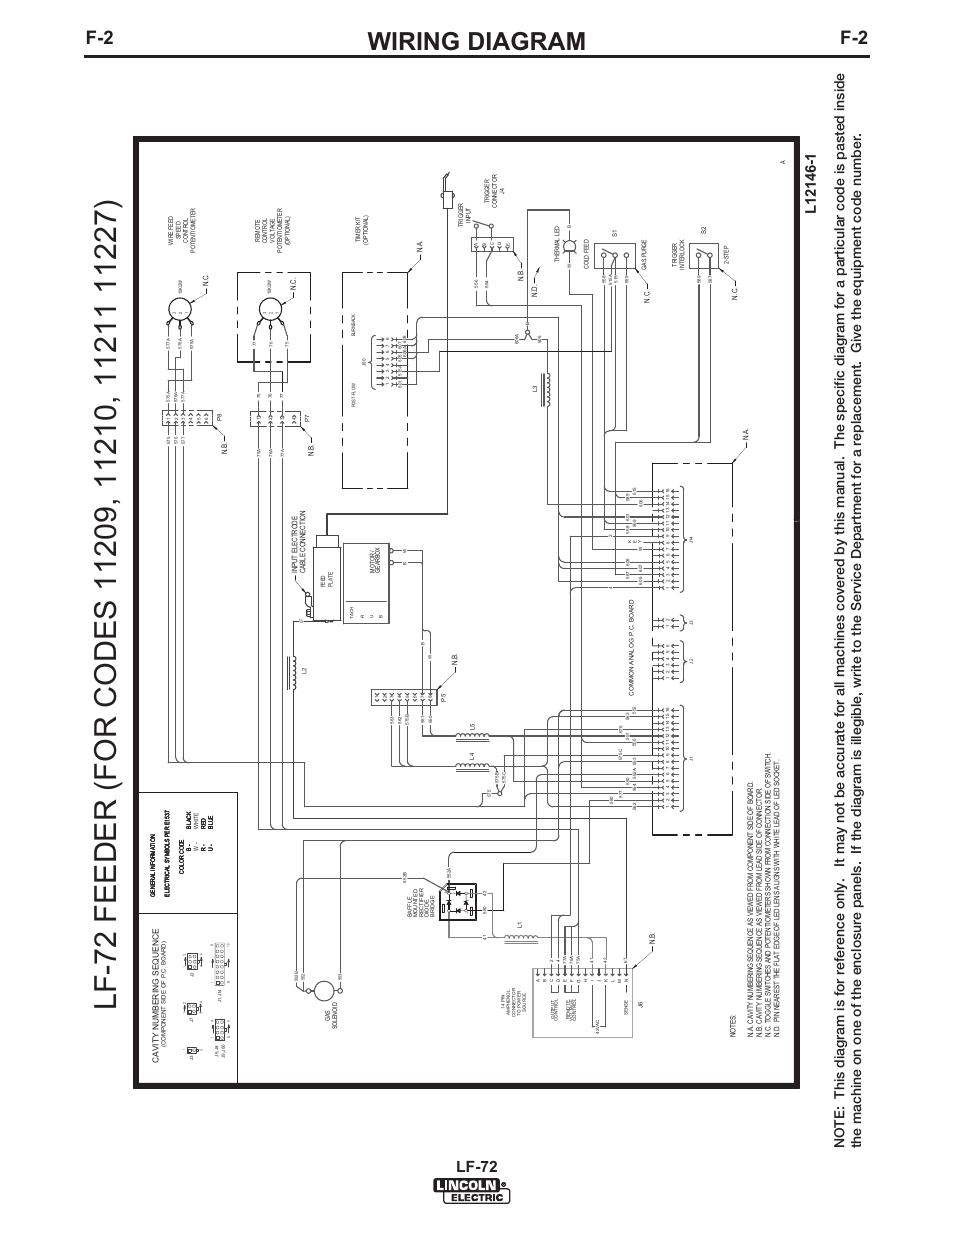 medium resolution of wiring diagram lf 72 lincoln electric im847 lf 72 wire feeder lincoln electric wire diagram